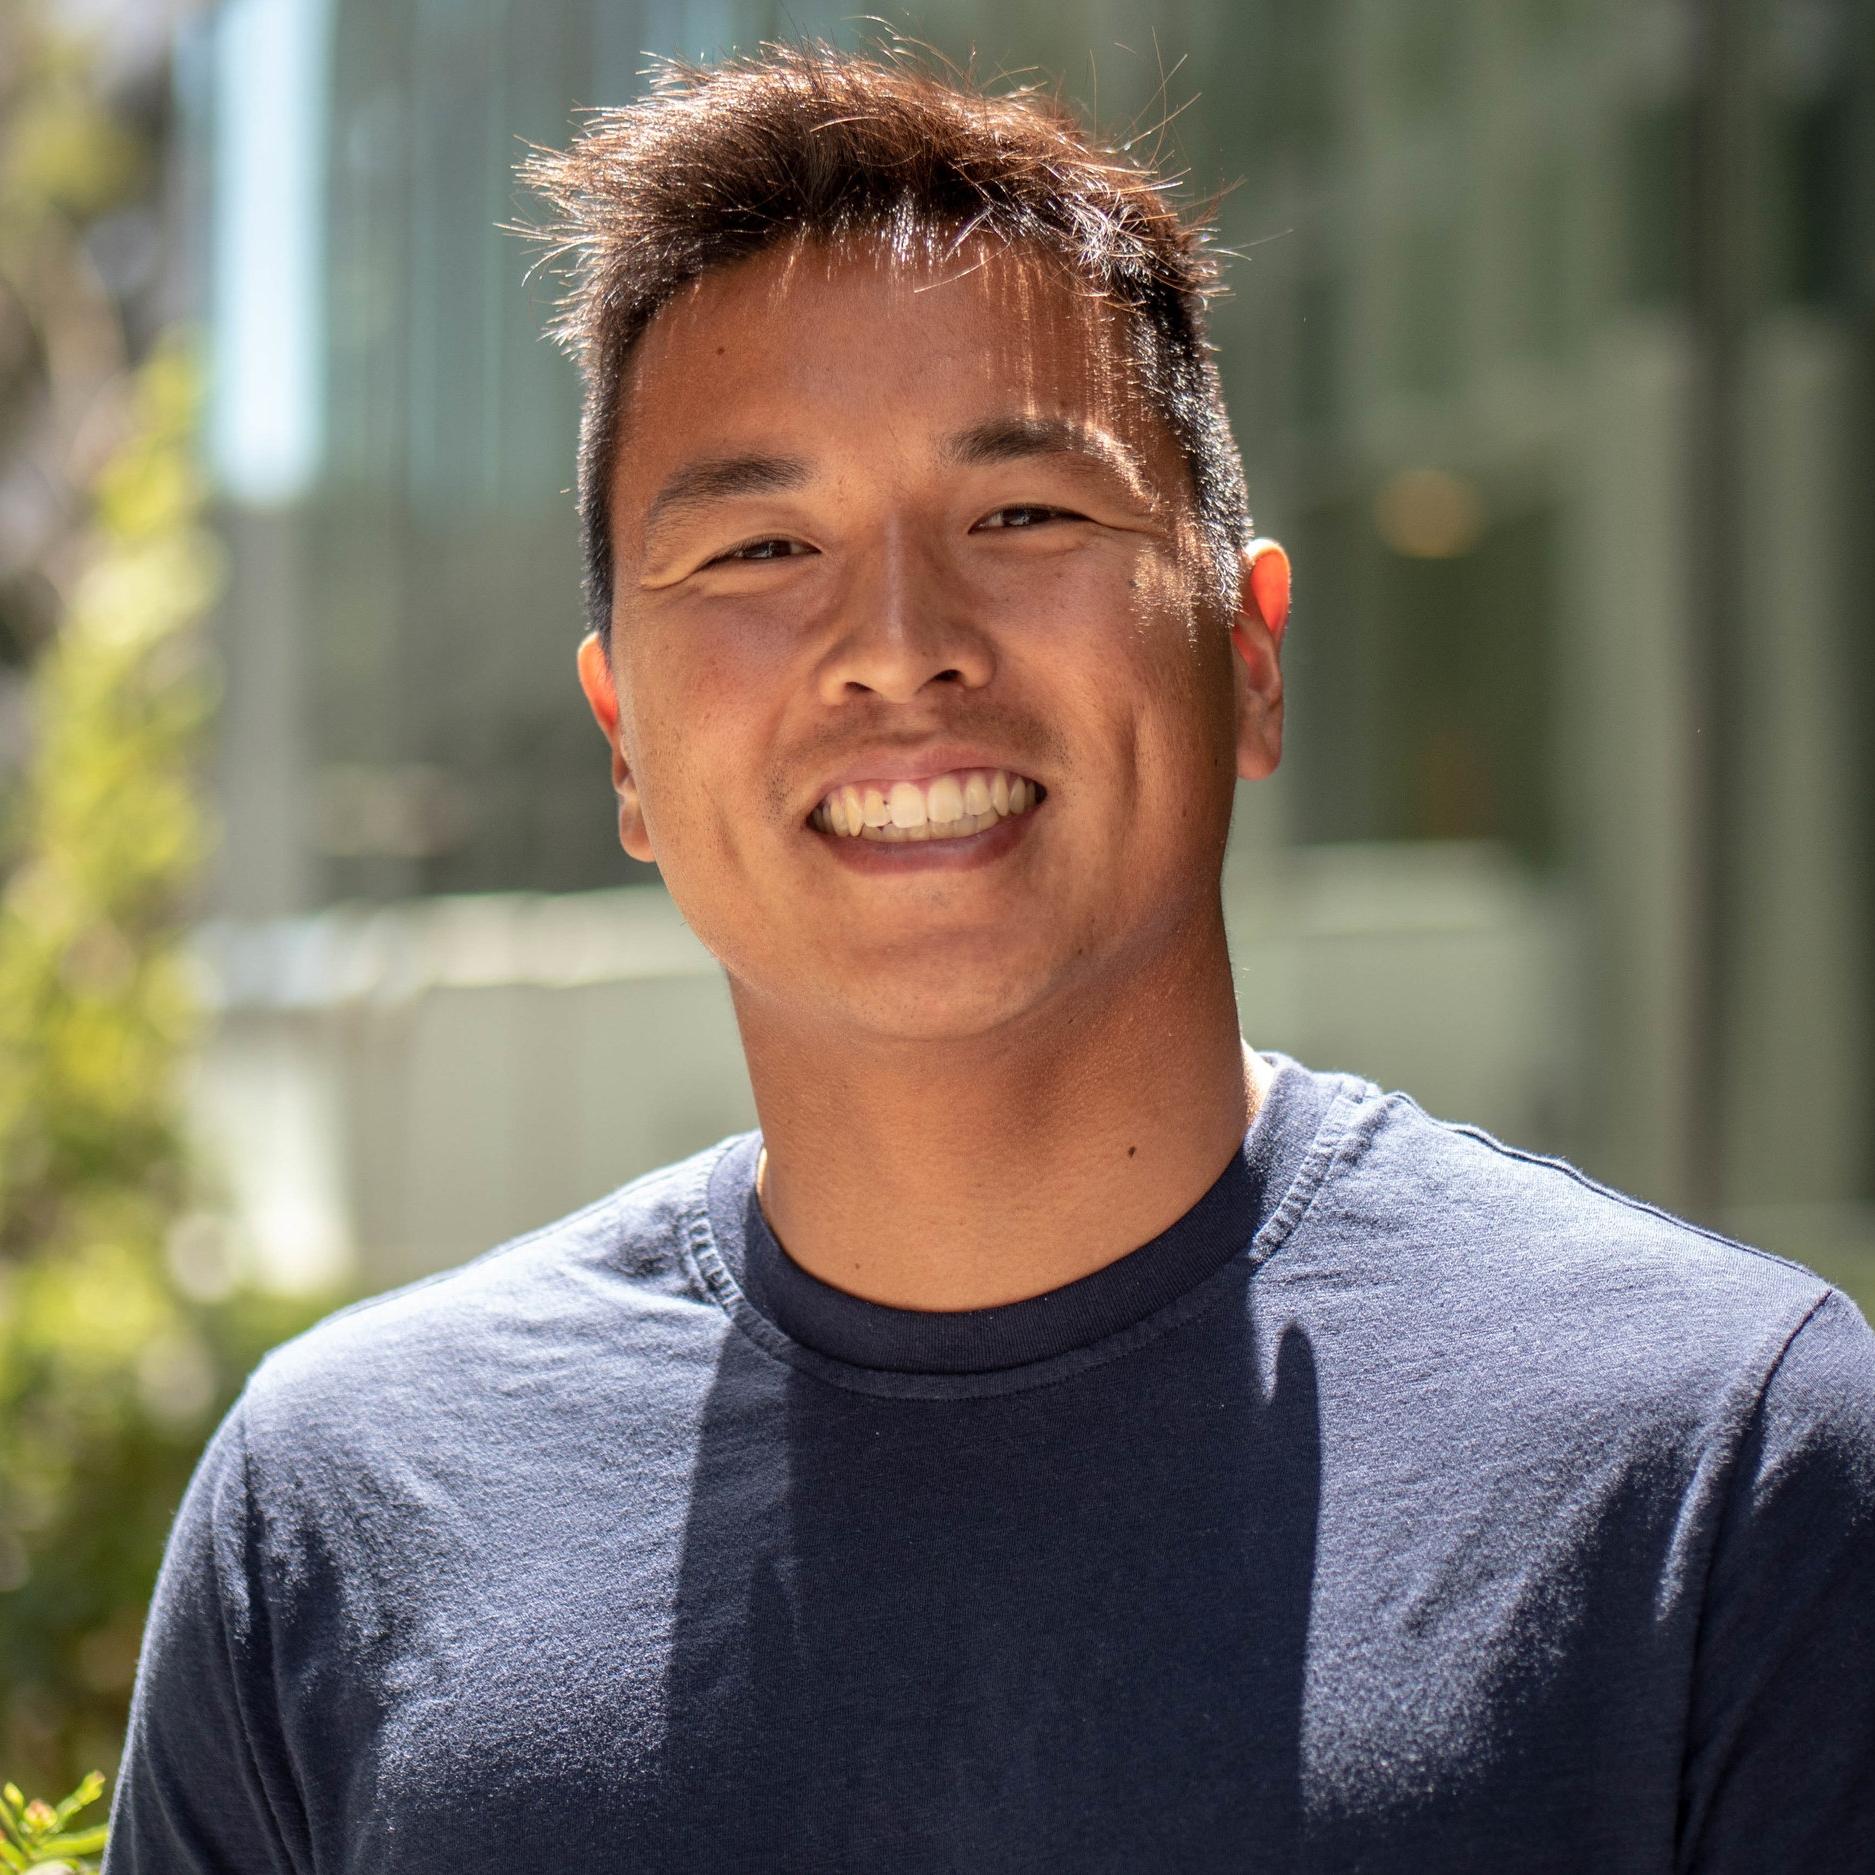 Jaime Dybuncio, Business Operations Manager - Fivestars